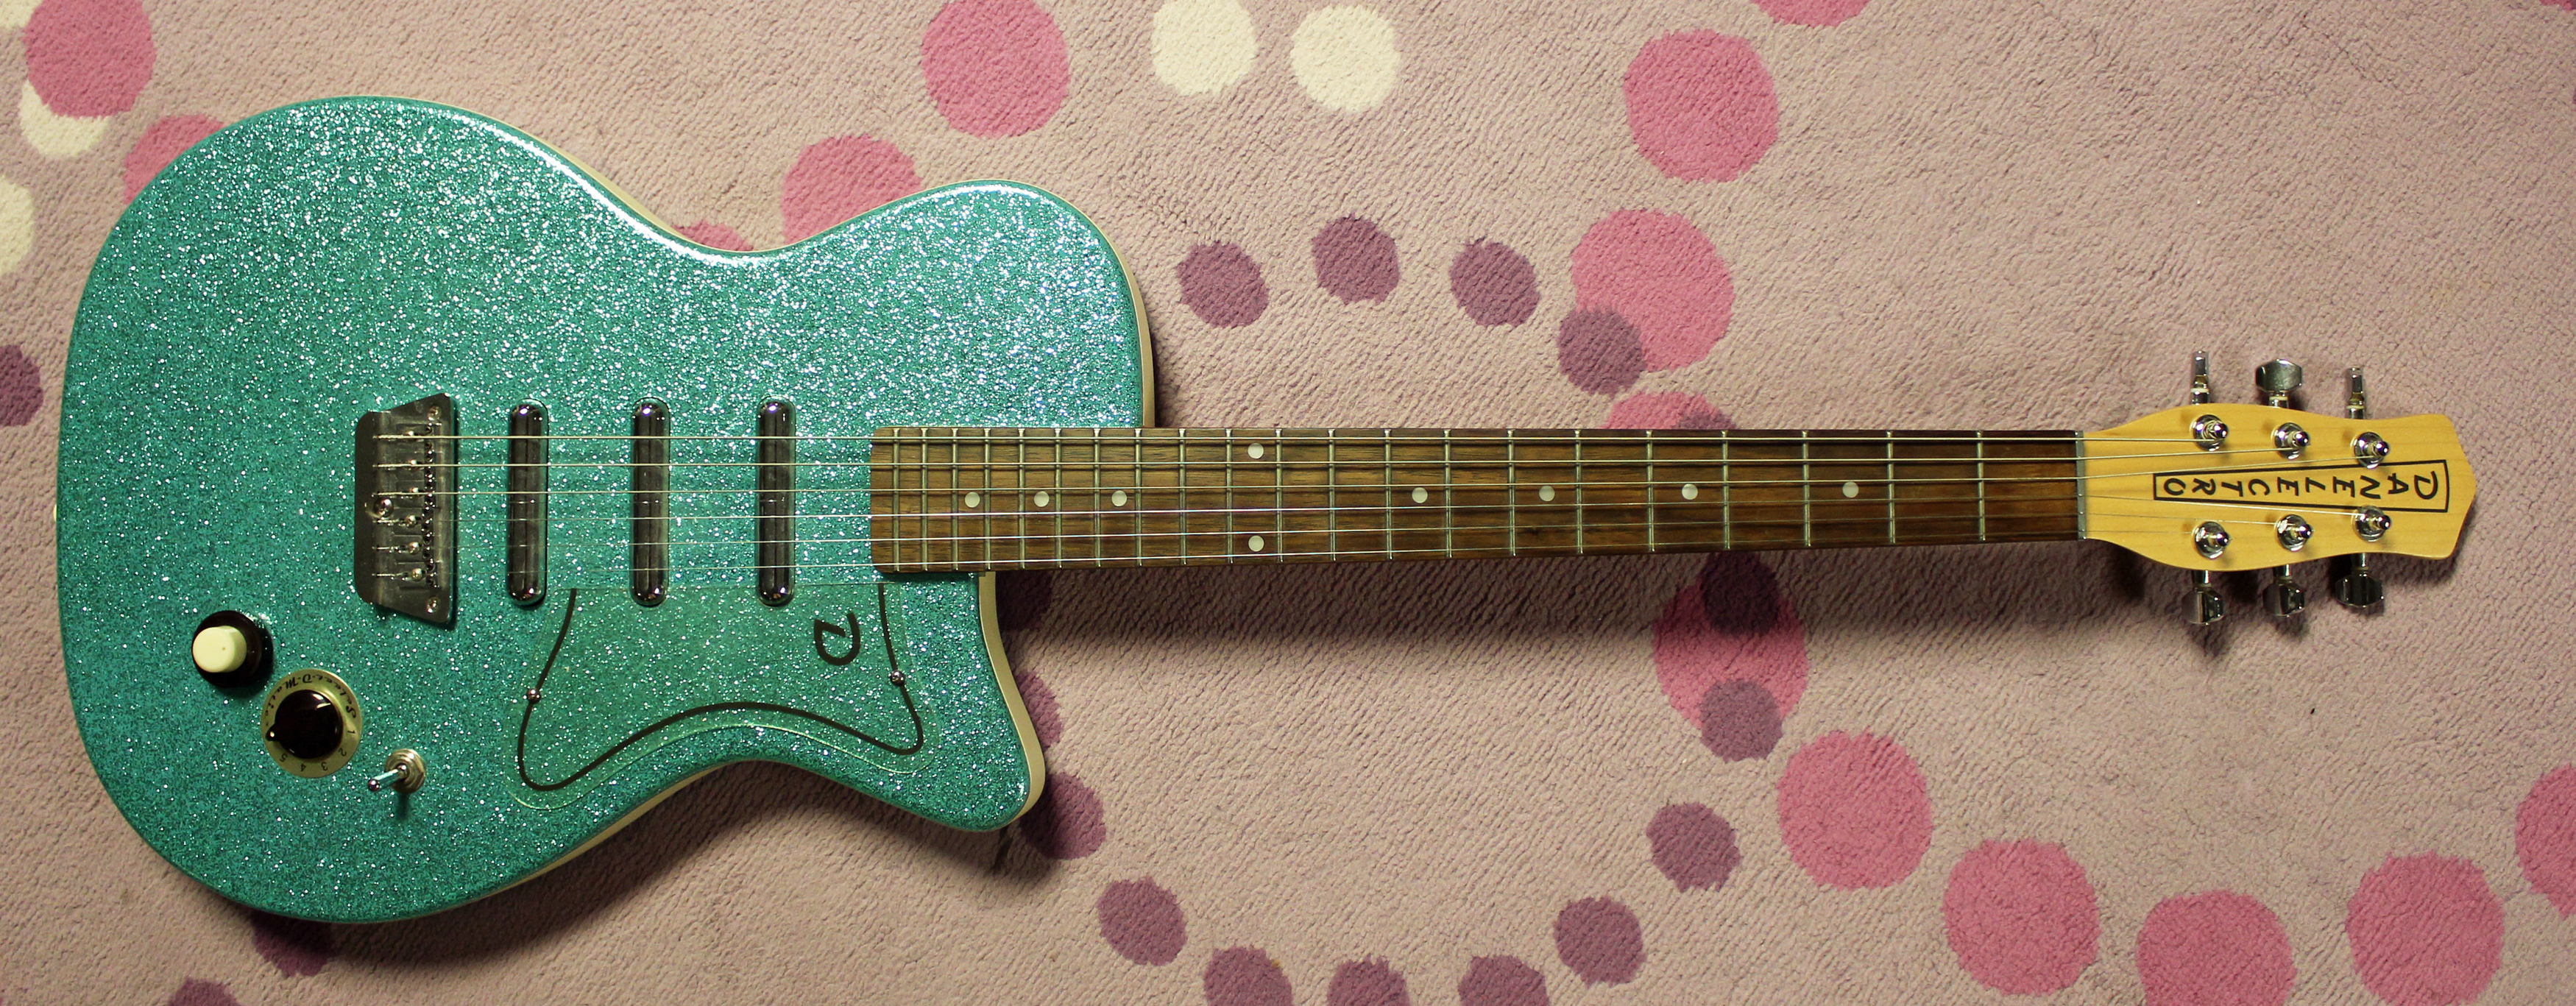 Korea, China, etc  Guitars – Drowning in Guitars!